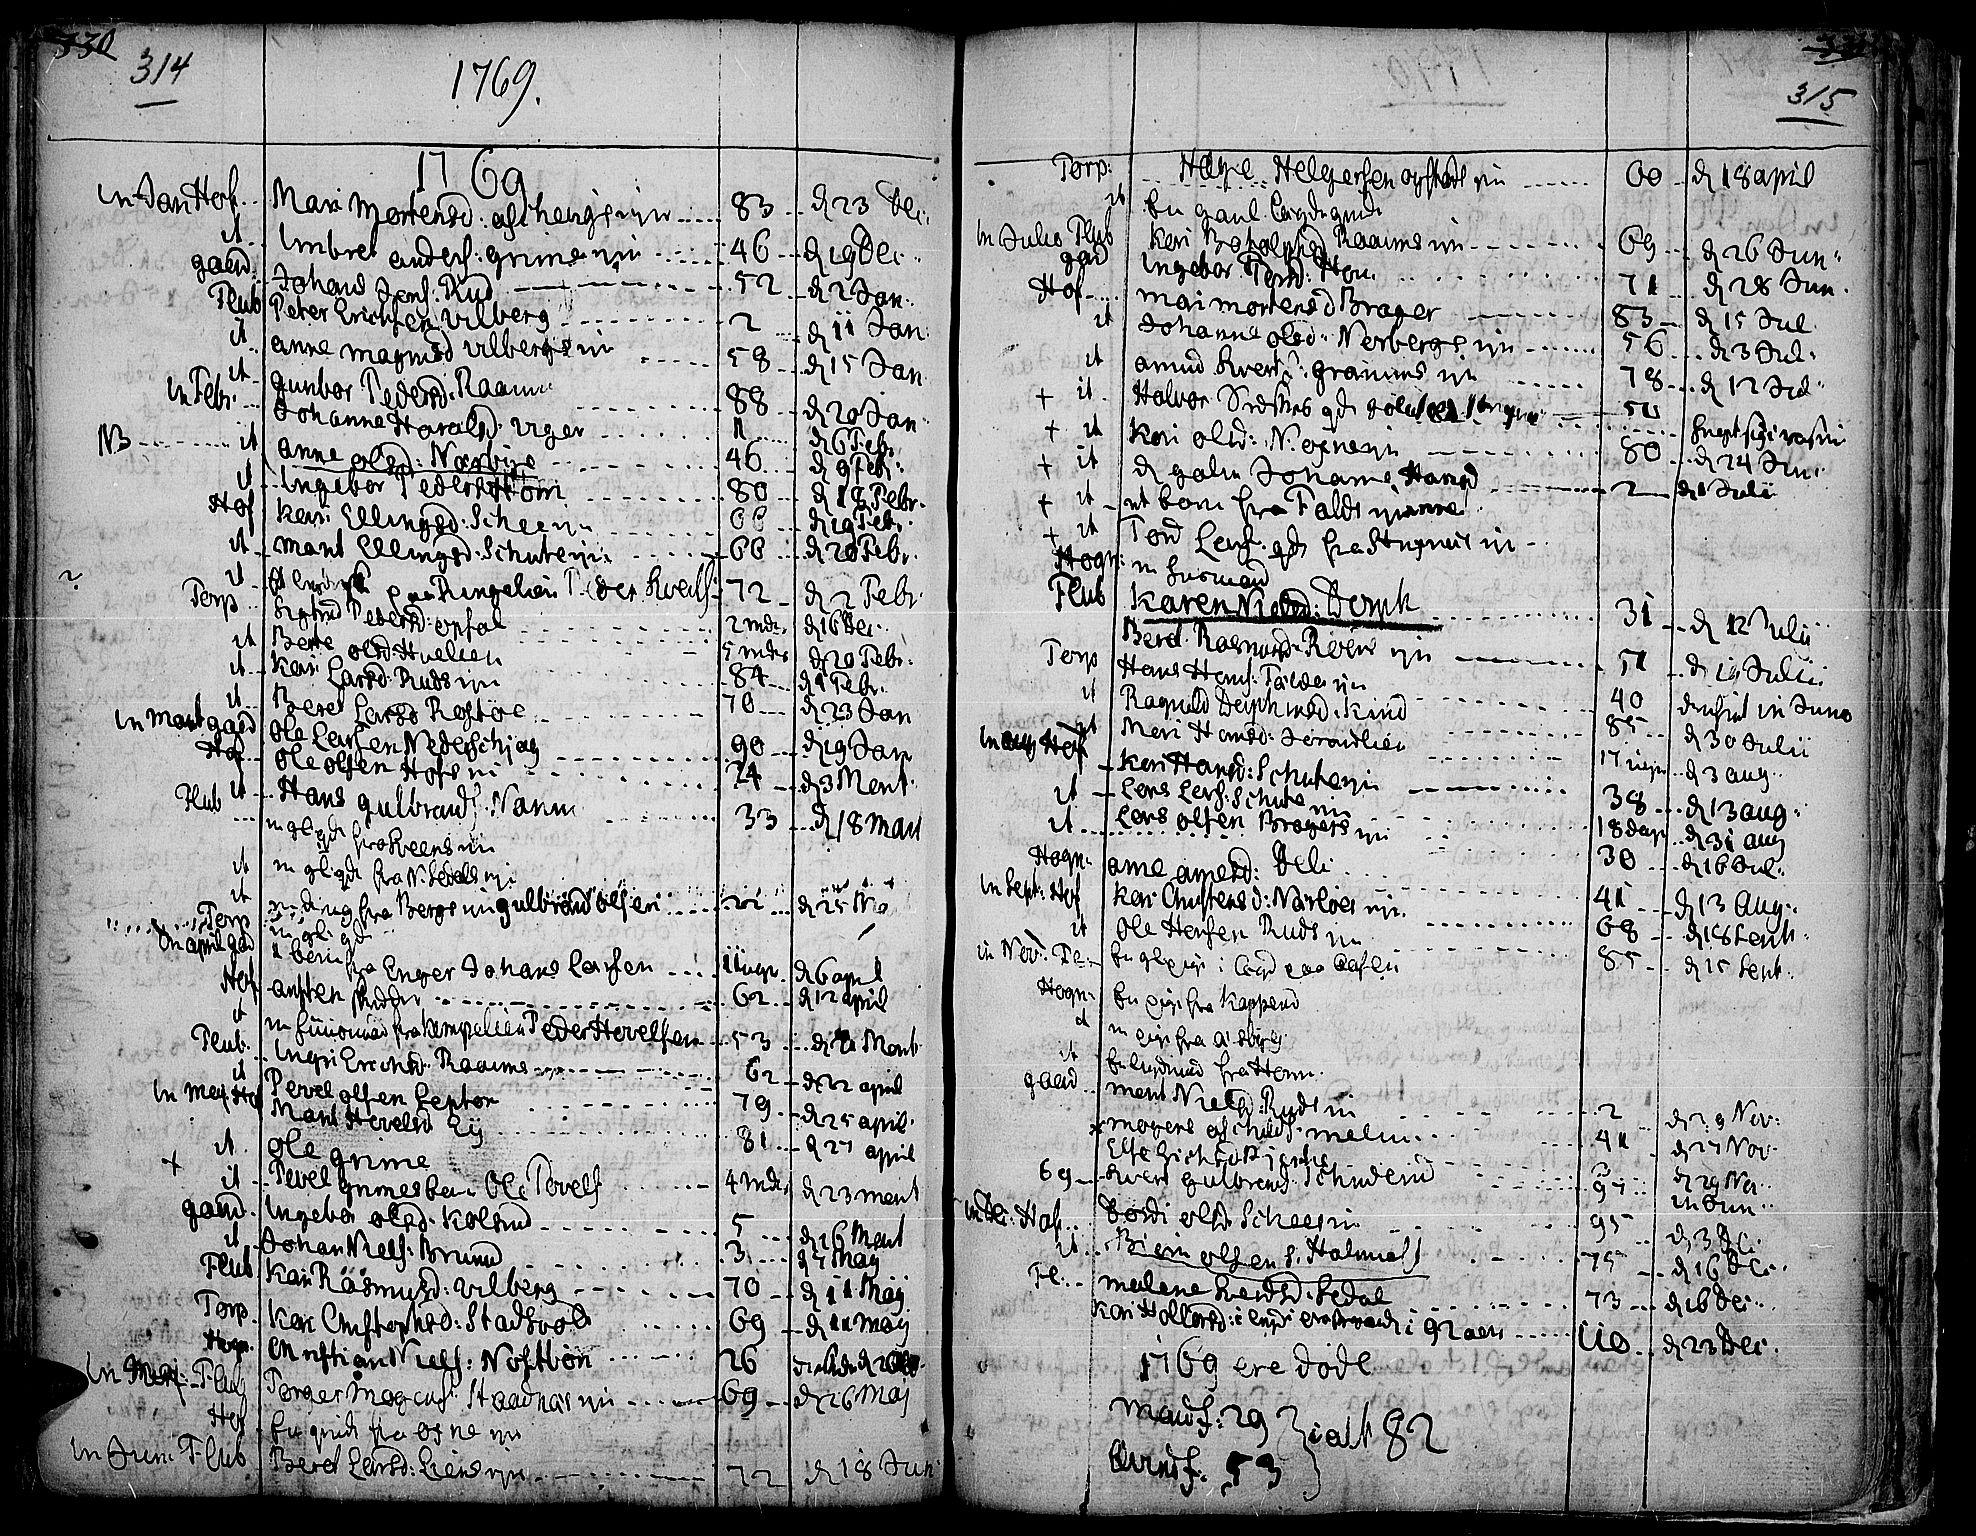 SAH, Land prestekontor, Ministerialbok nr. 5, 1765-1784, s. 314-315